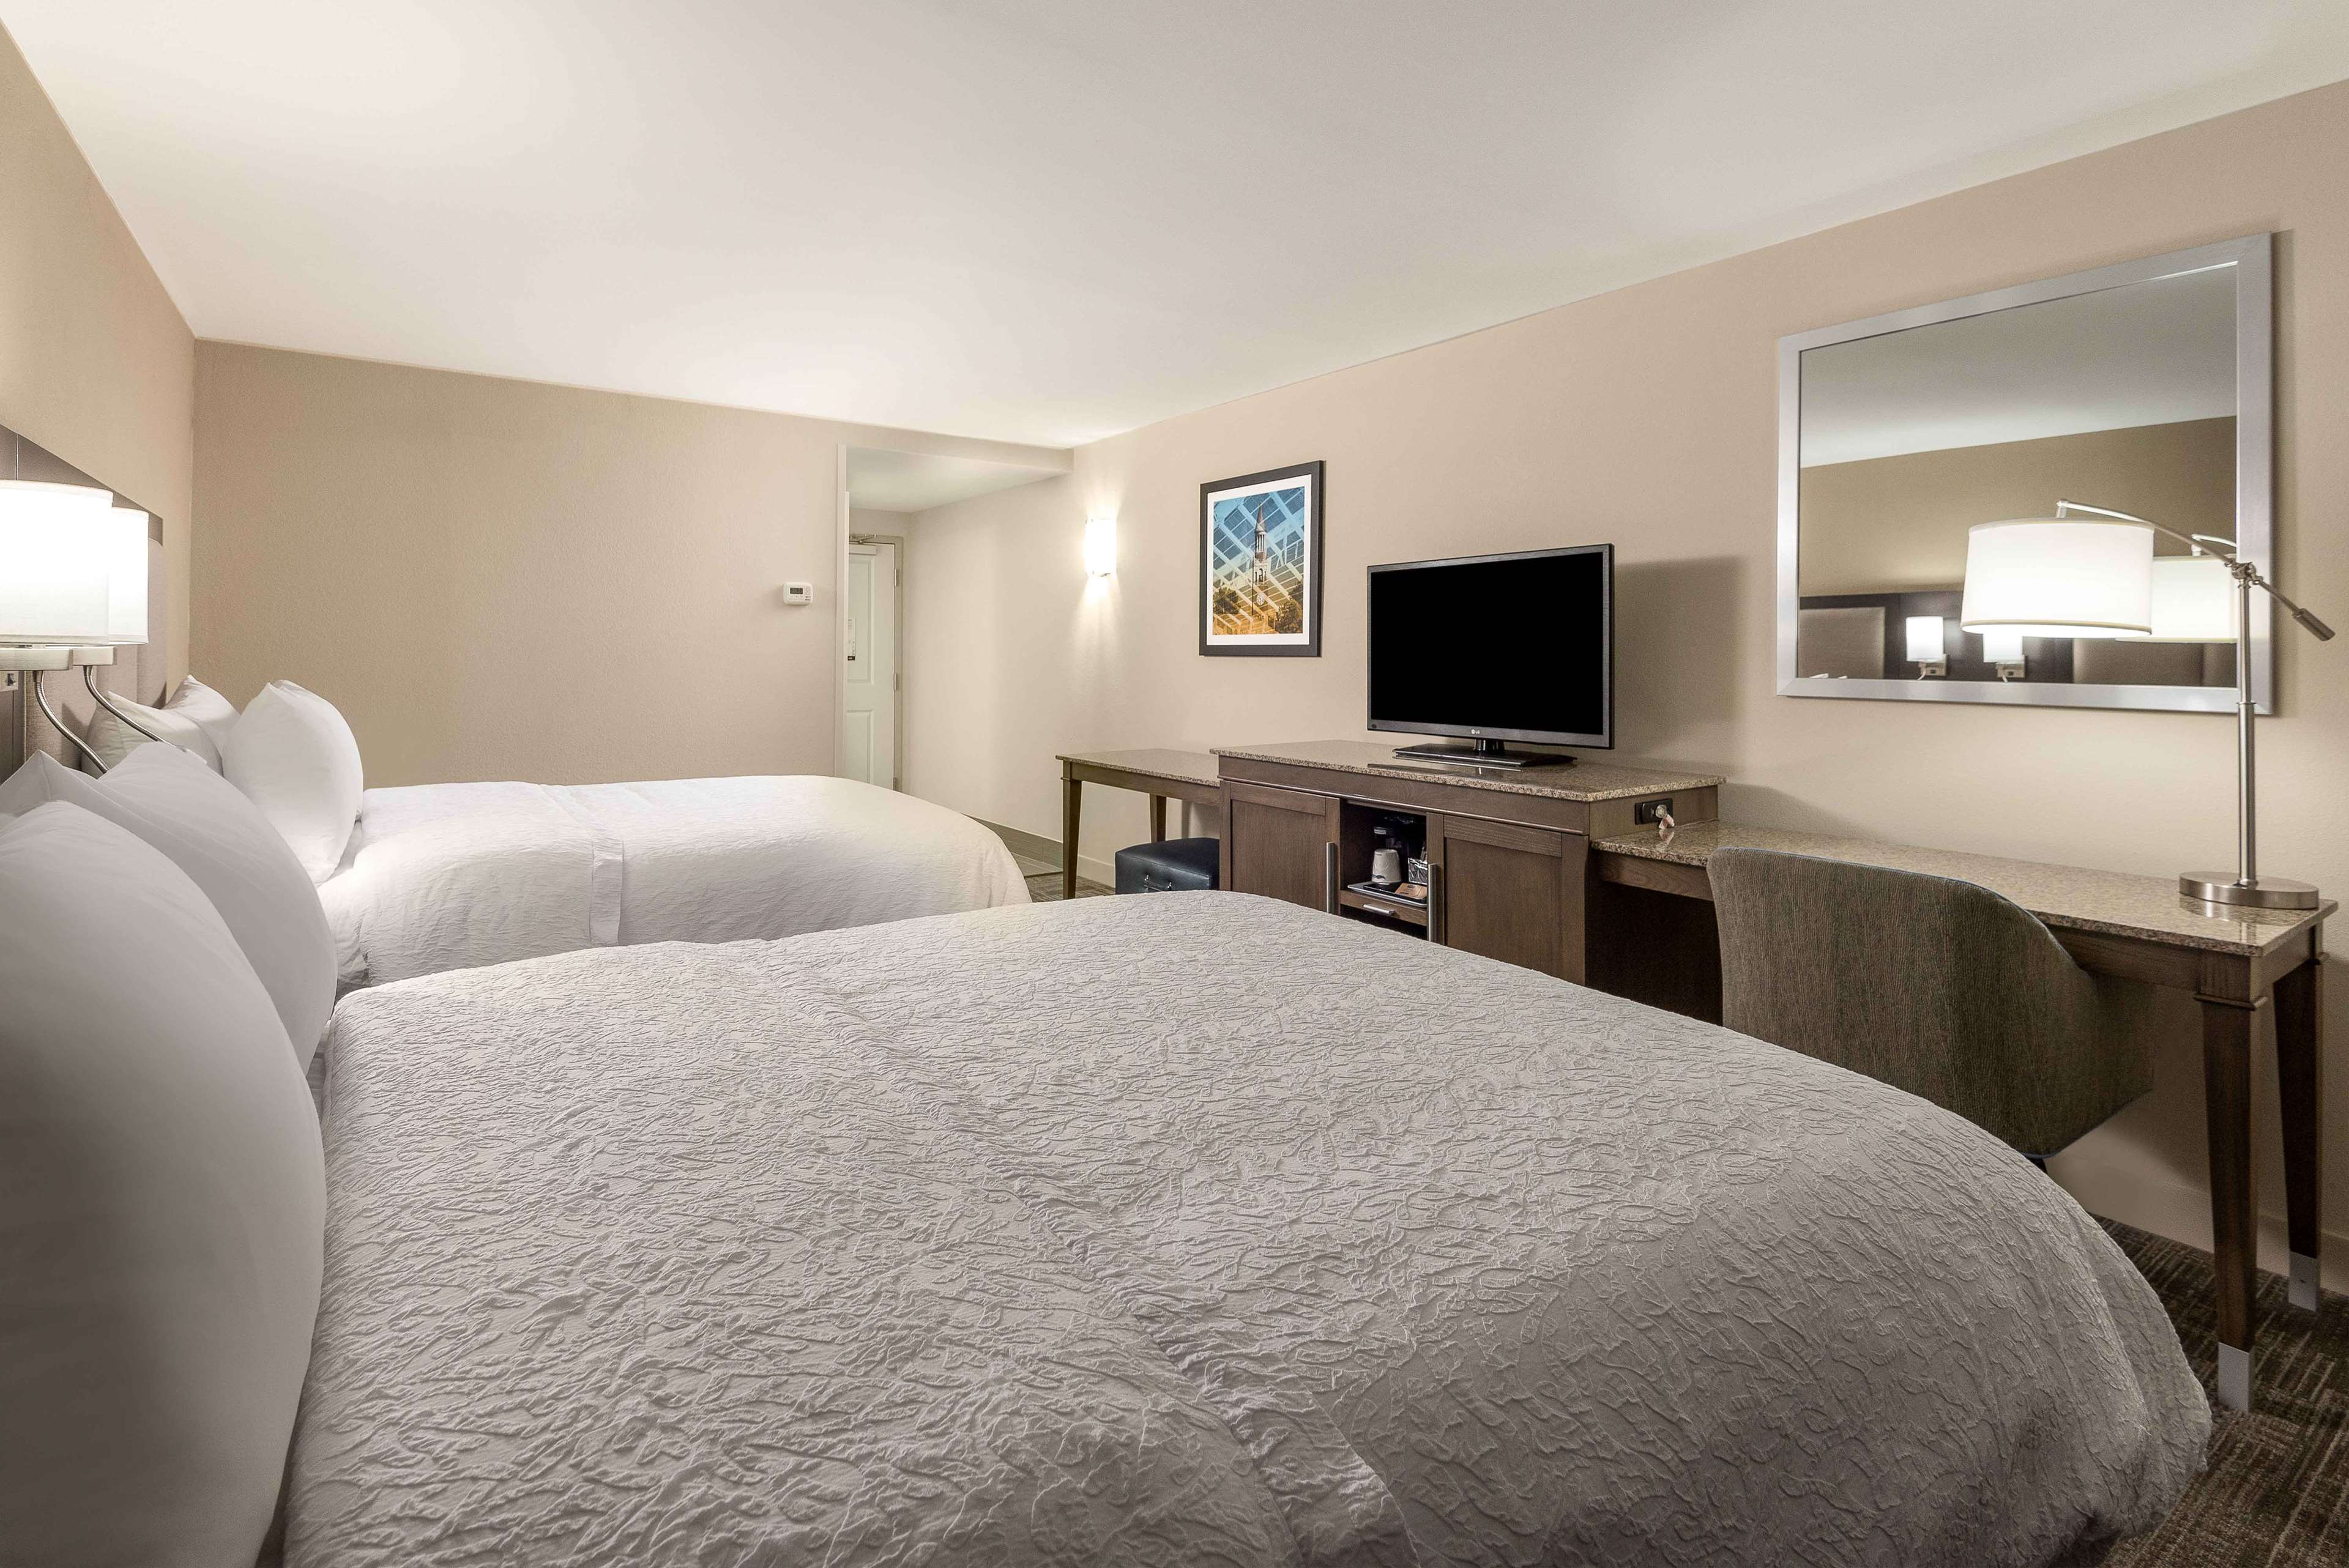 Hampton Inn & Suites Chapel Hill/Durham, Area image 10